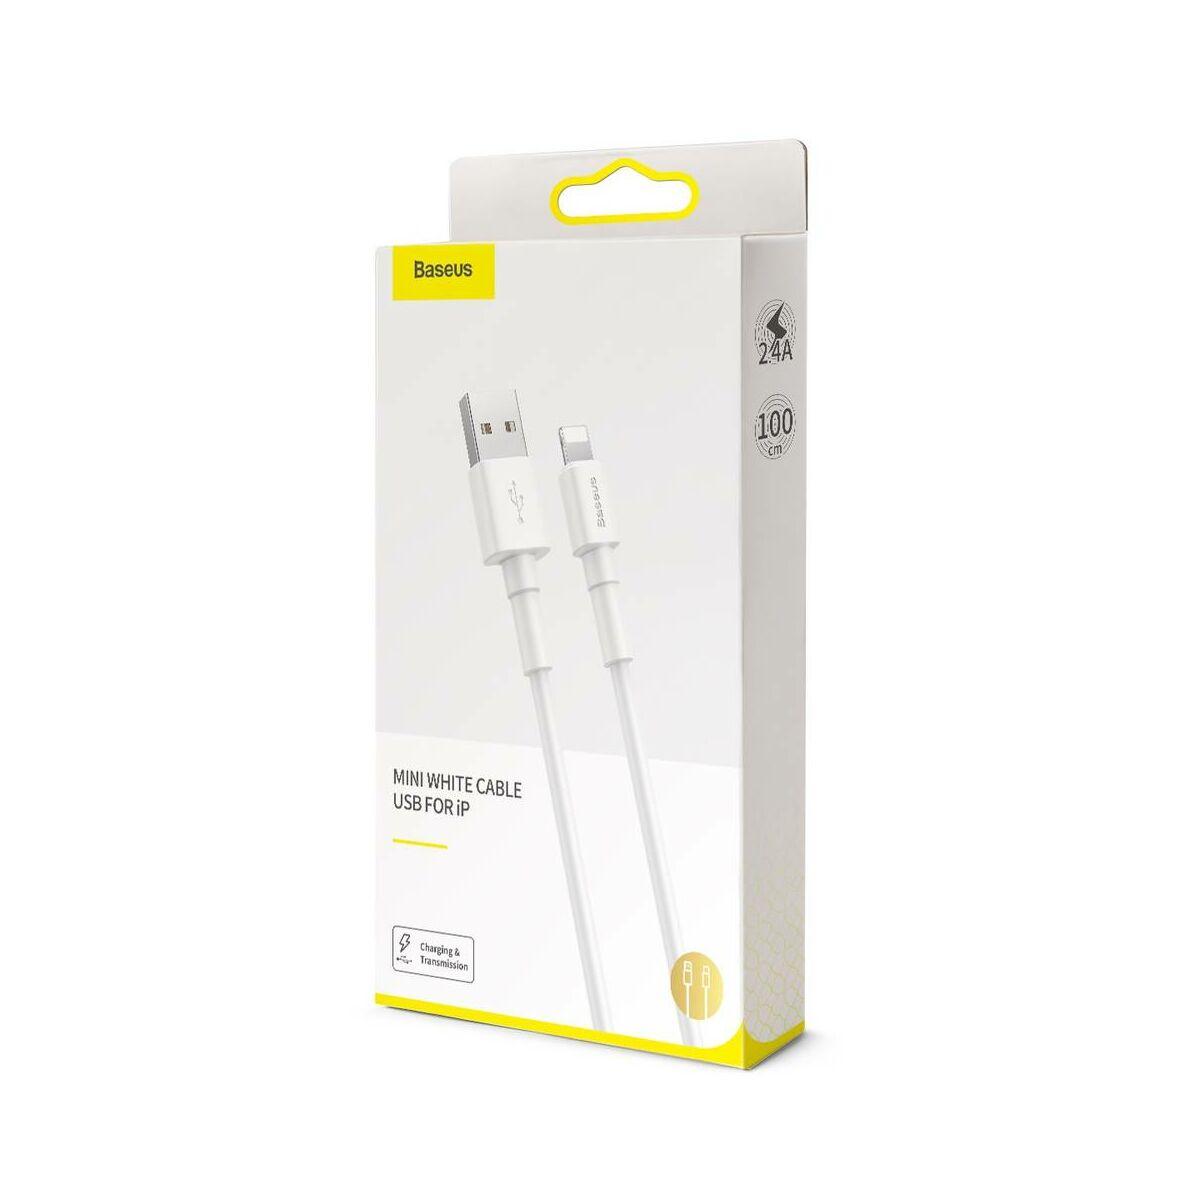 Baseus Lightning kábel, Mini 2.4A, 1m, fehér (CALSW-02)